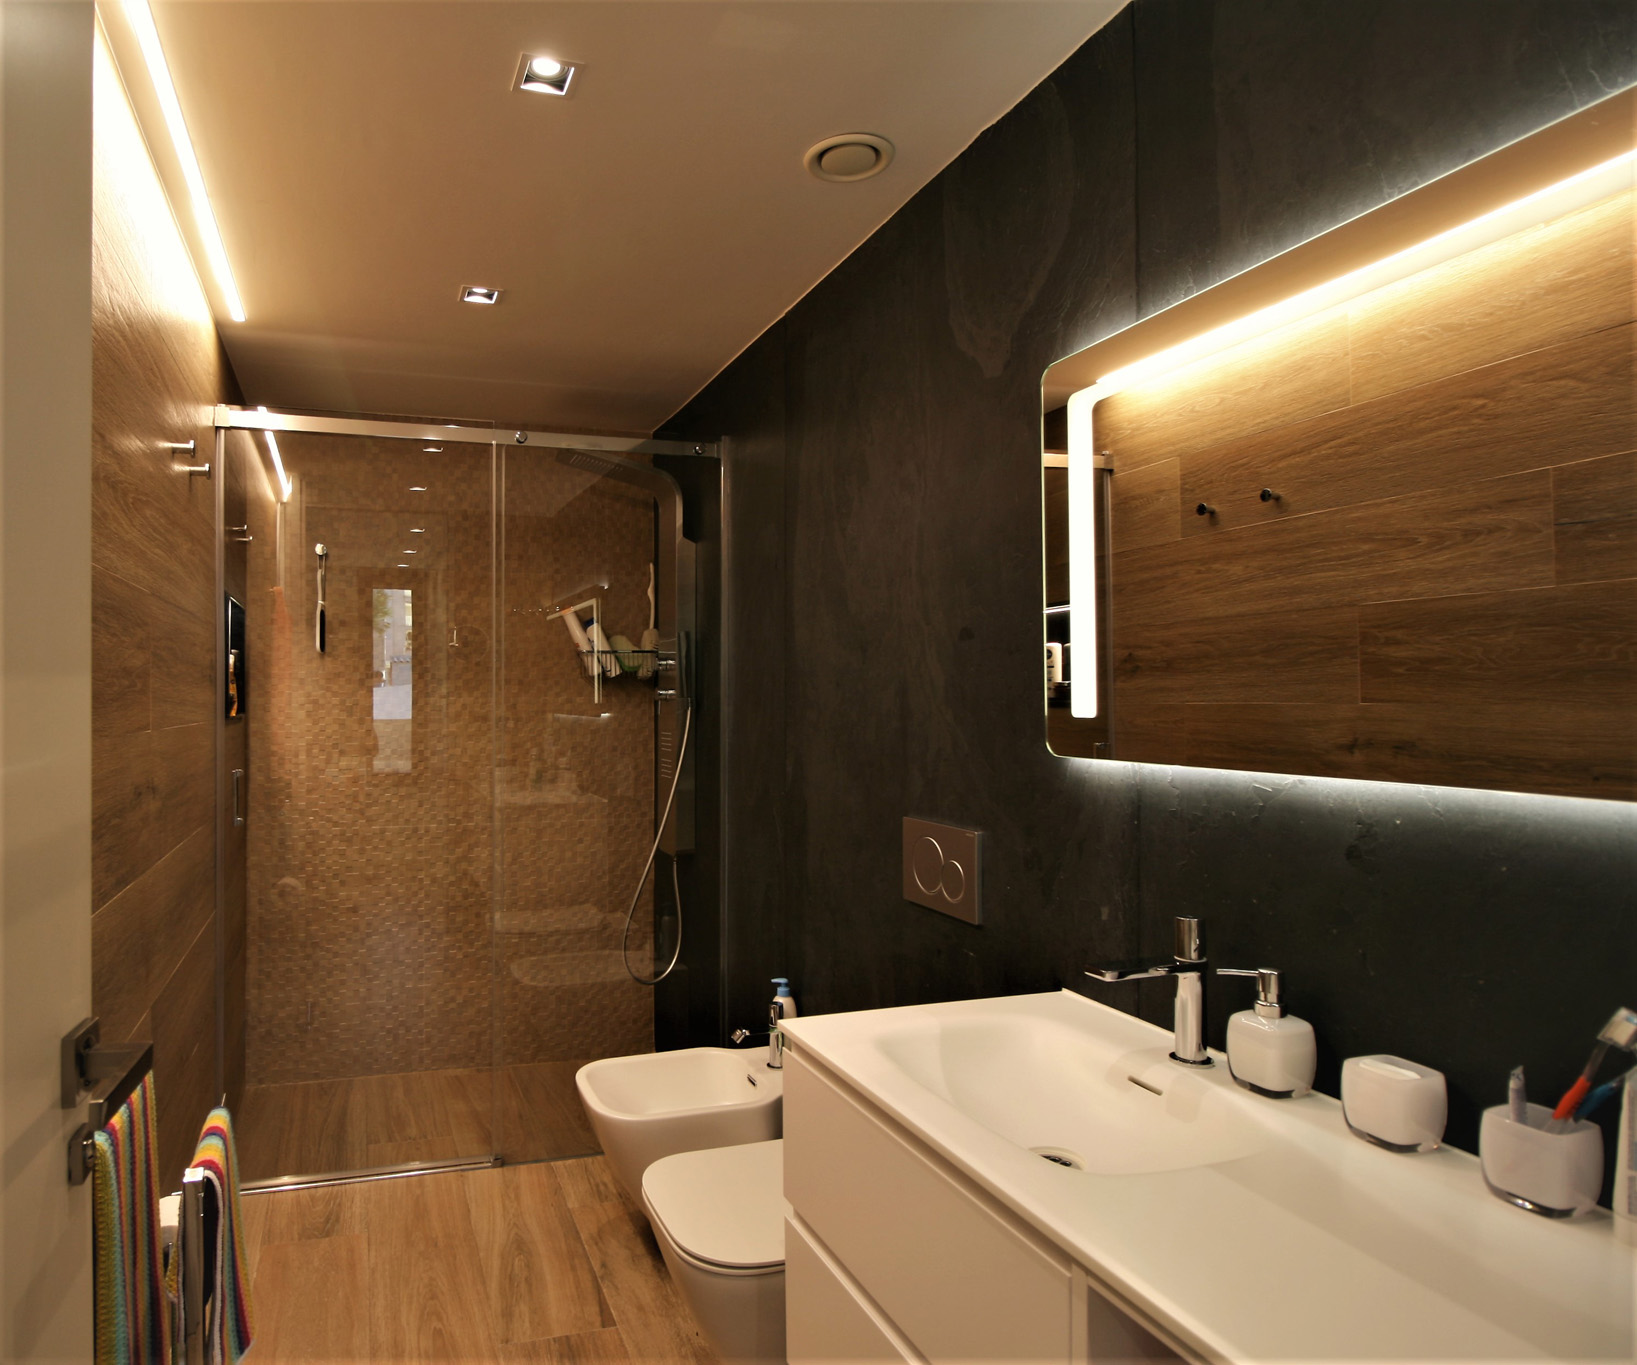 diseño-interior-baño-madera